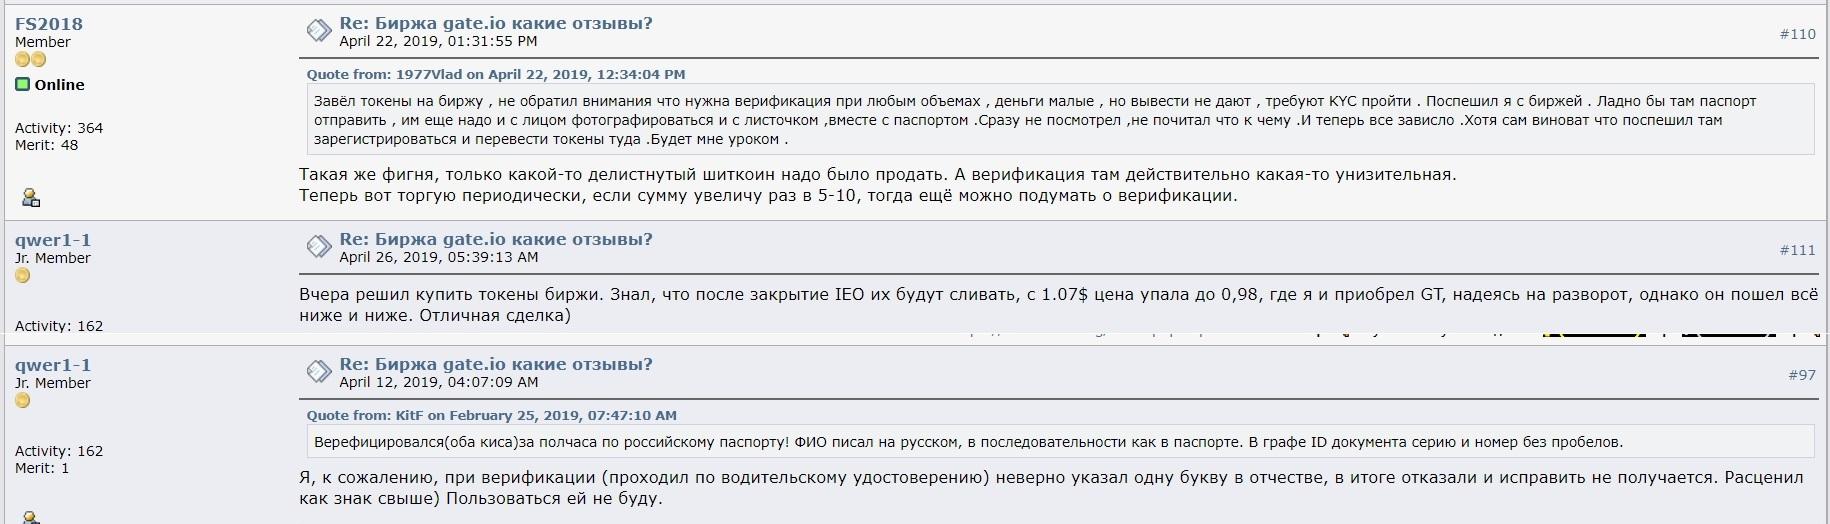 16. Отзывы gate-io 1